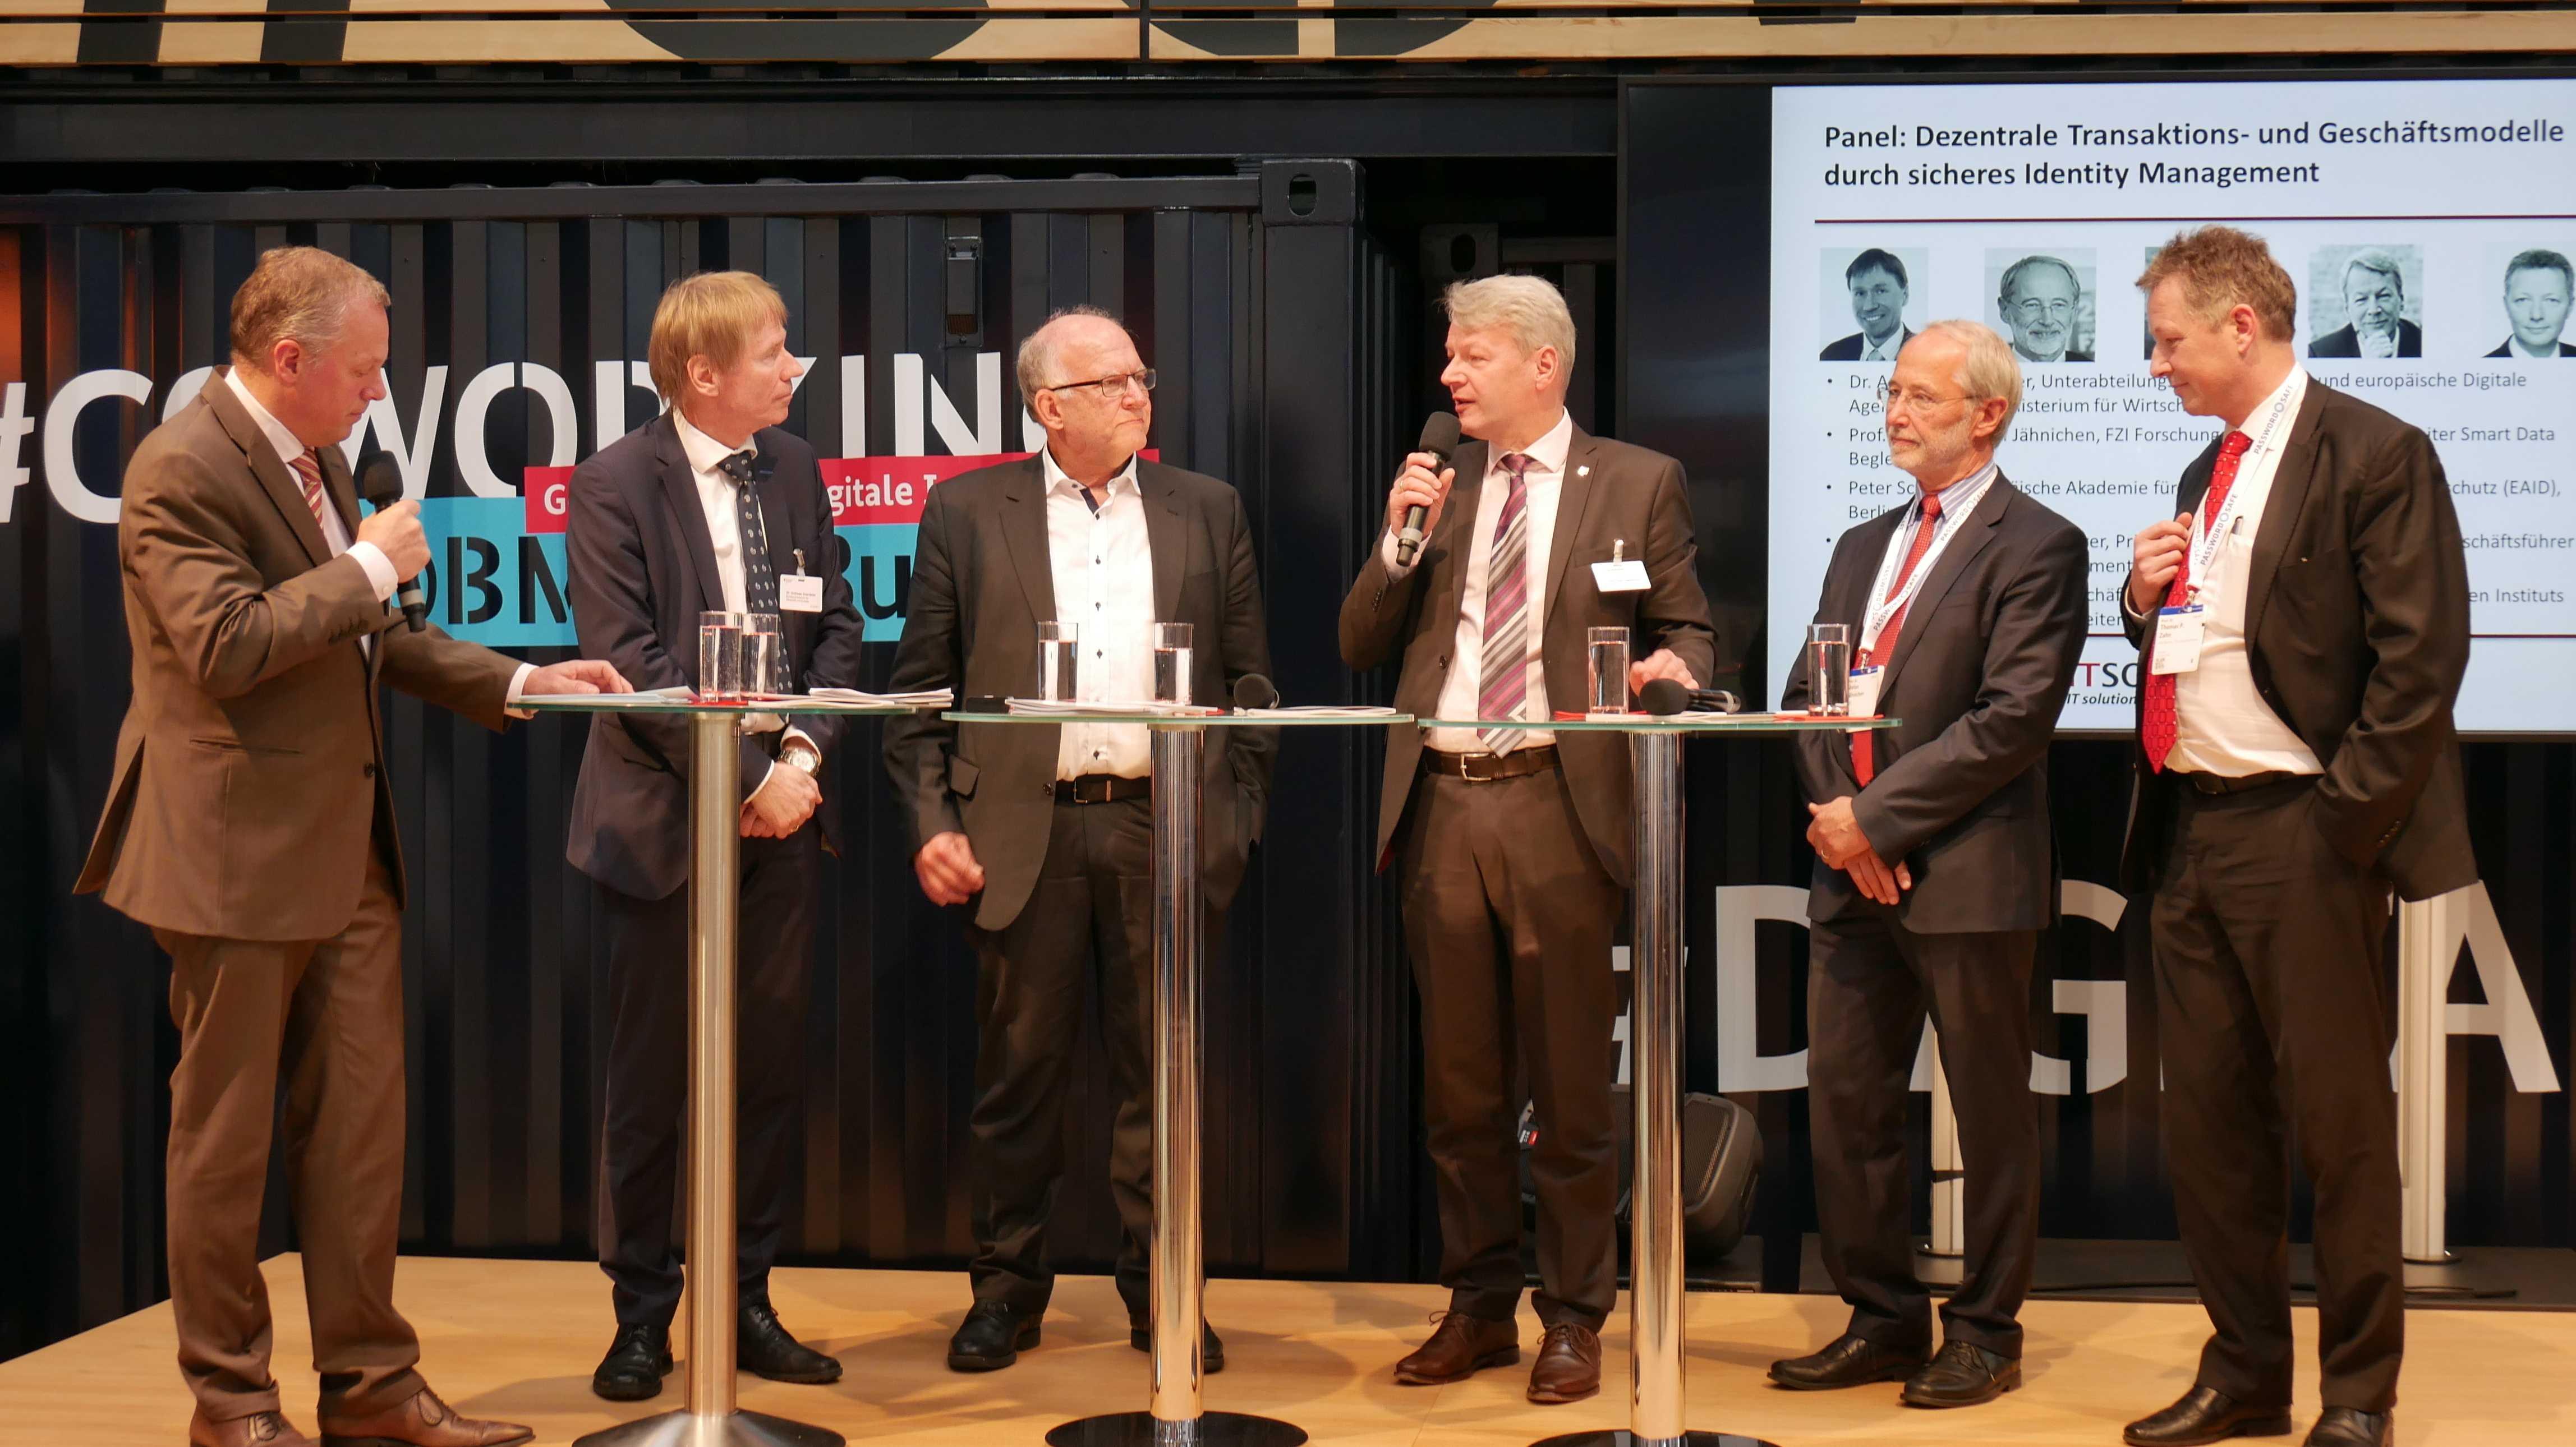 Ulrich Walter, Andreas Goerdeler, Peter Schaar, Peter Liggesmeyer, Stefan Jaehnichen, Thomas Zahn